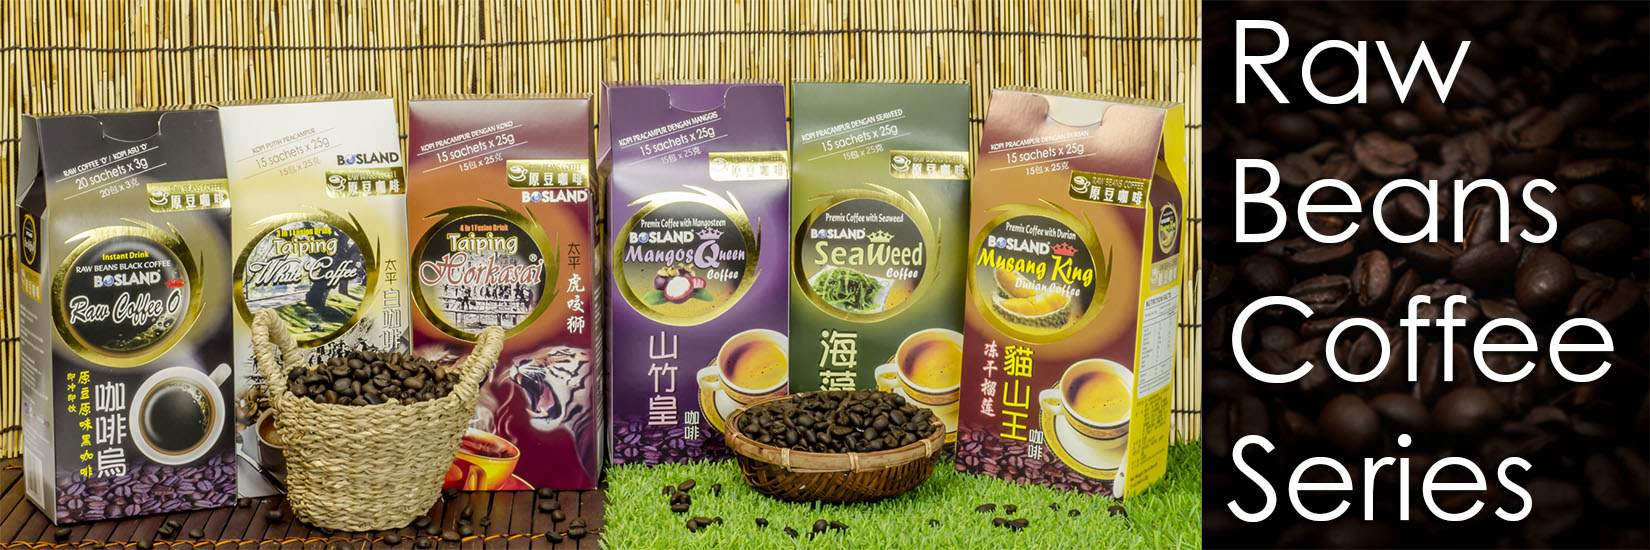 Raw Beans Coffee Series